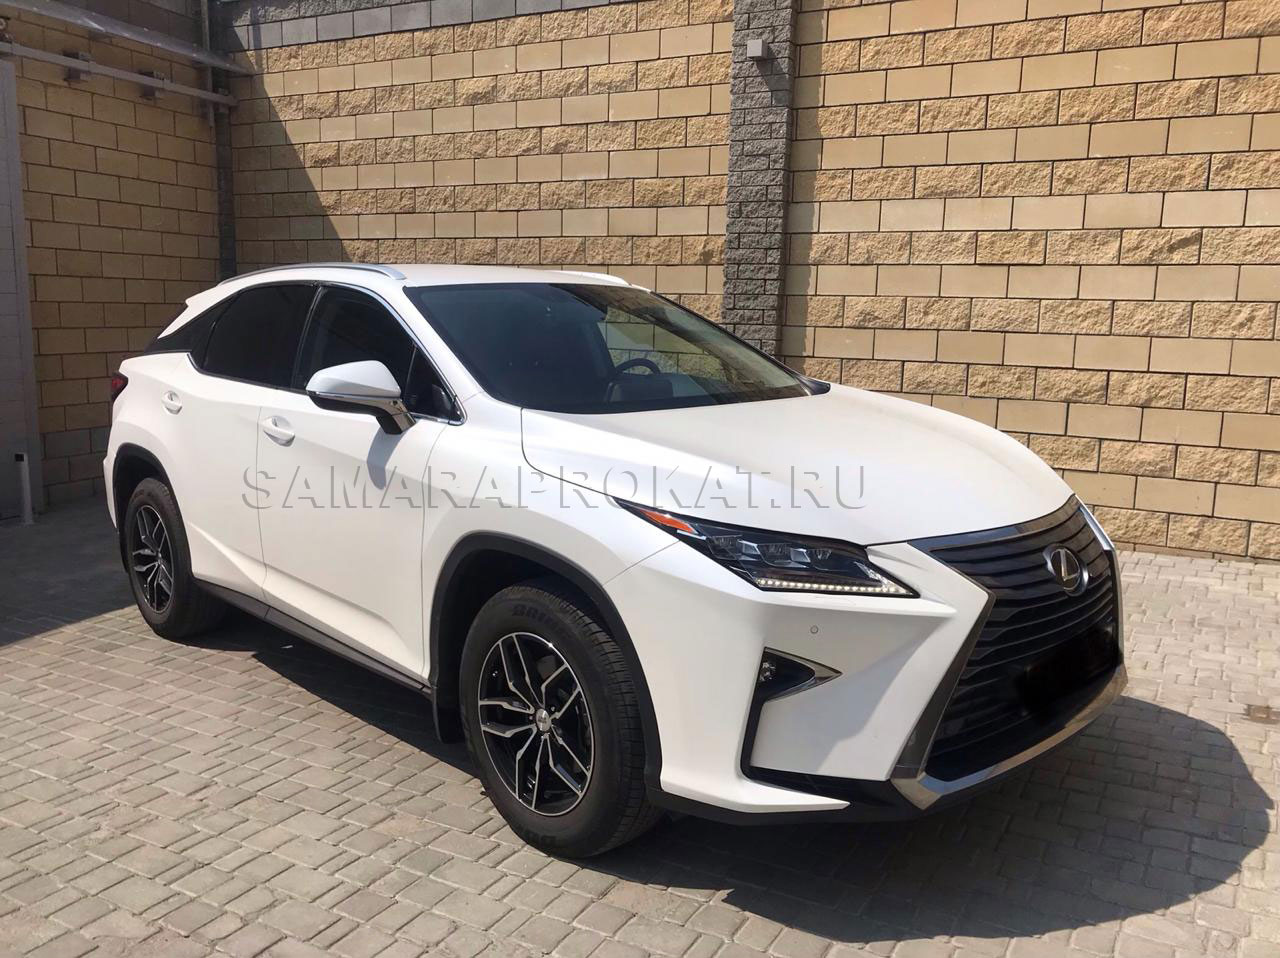 Lexus RX 2018 белого цвета в Самаре